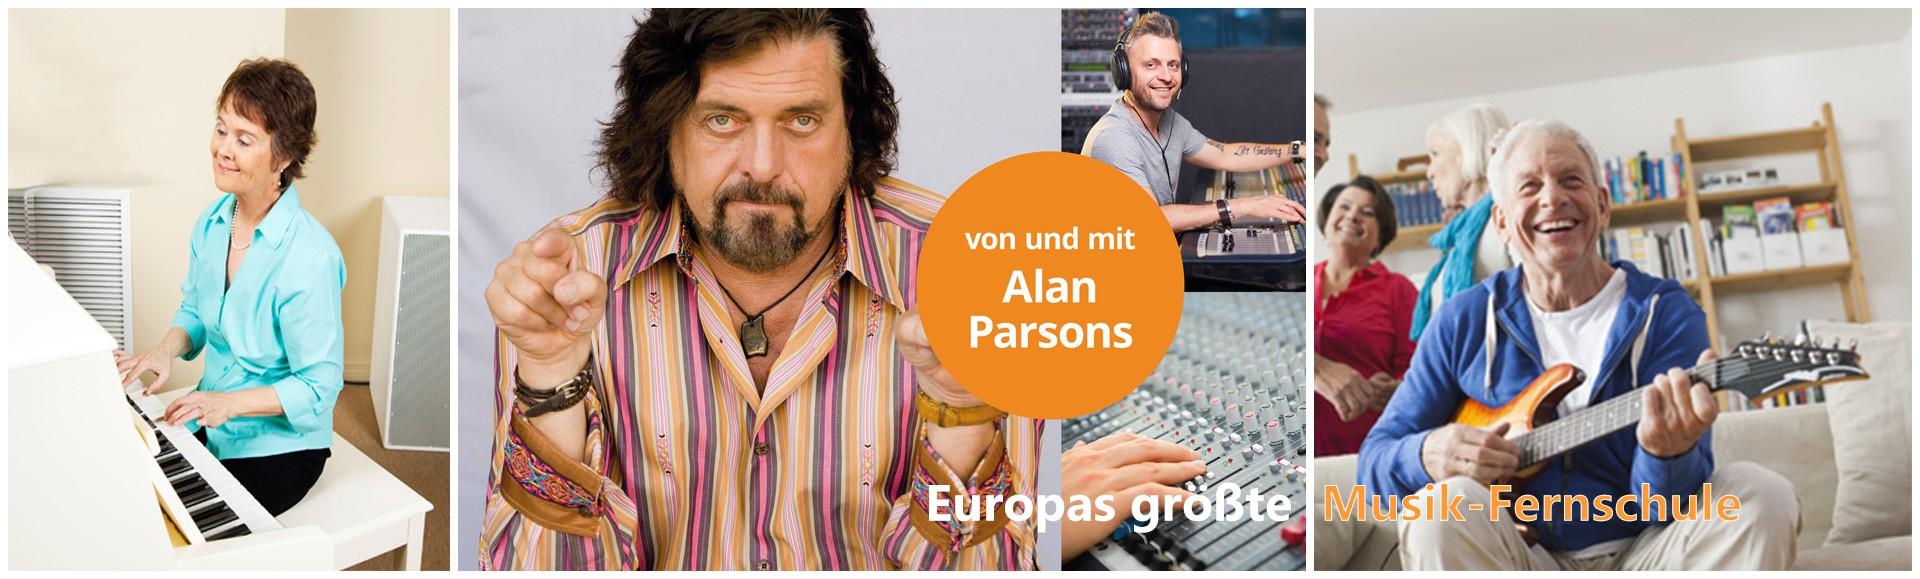 Slider_Klavier_Alan Parsons_Gitarre.jpg